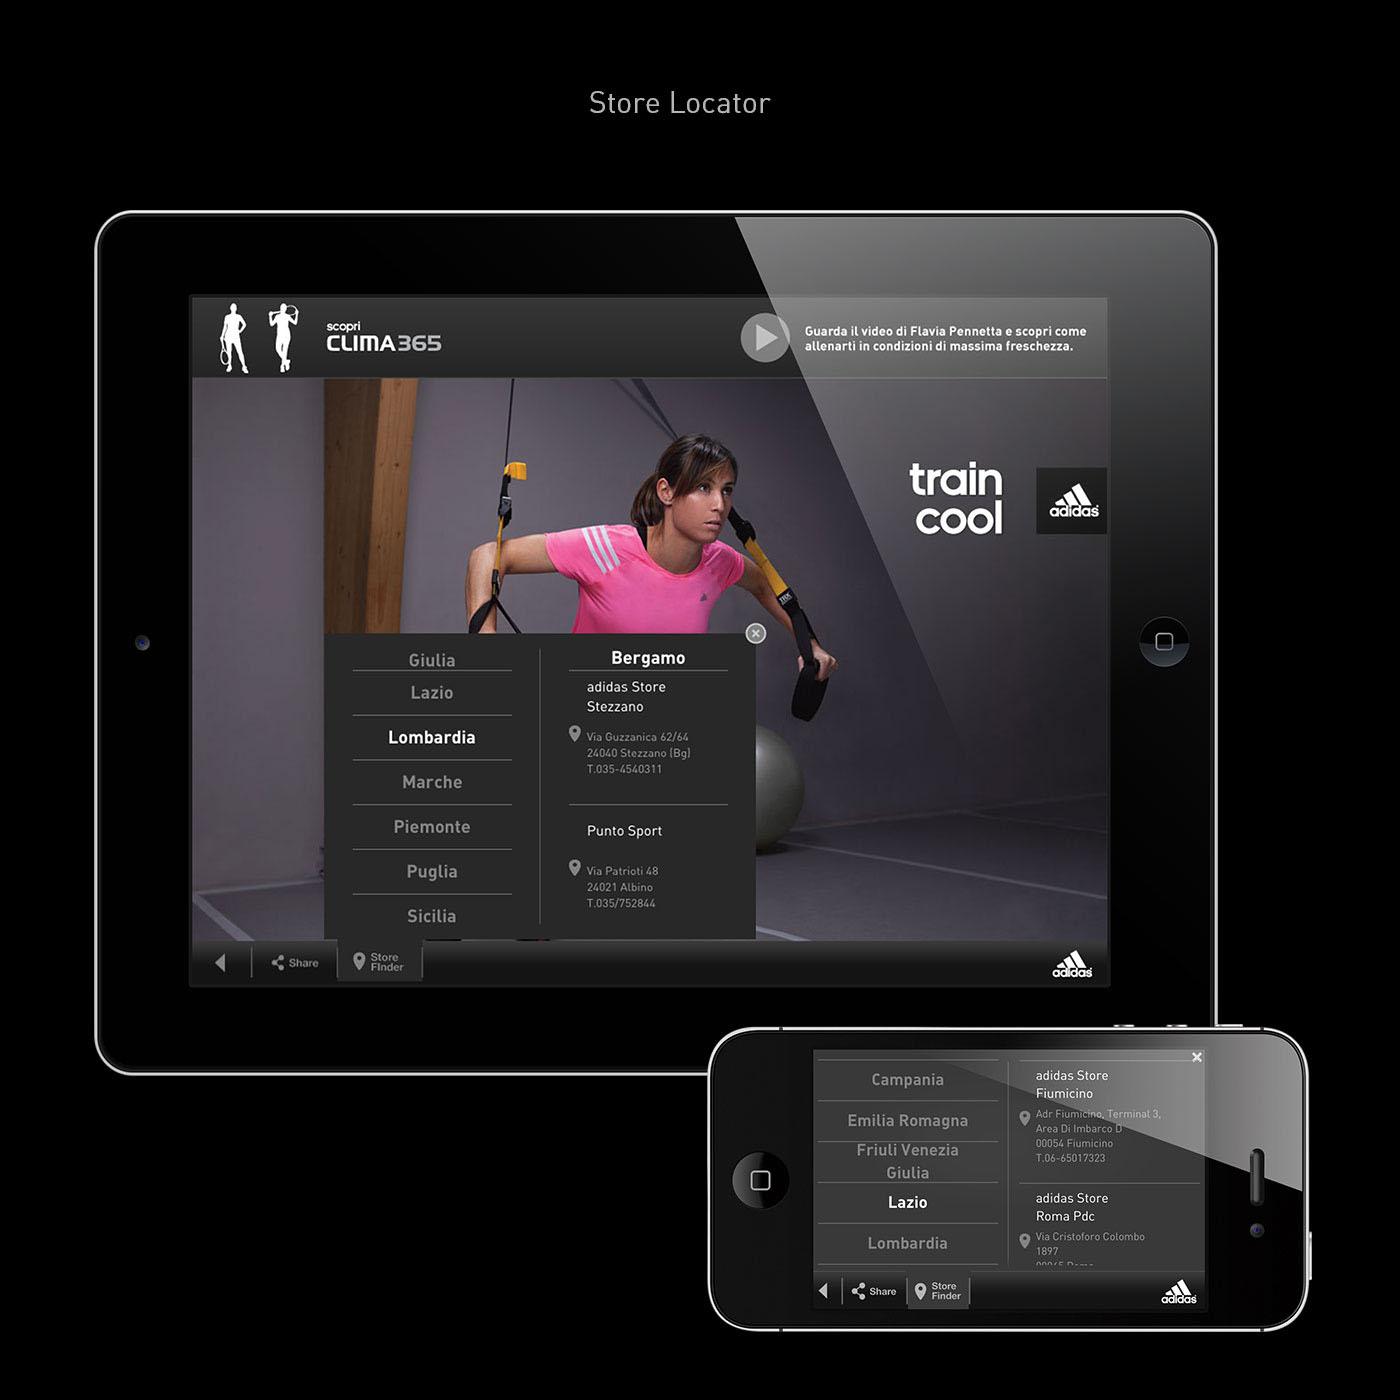 adidas training Italy iPad iphone apps storyboard daniele de rossi flavia pennetta valentina vezzali alessandro matri martin castrogiovanni football tennis fencing